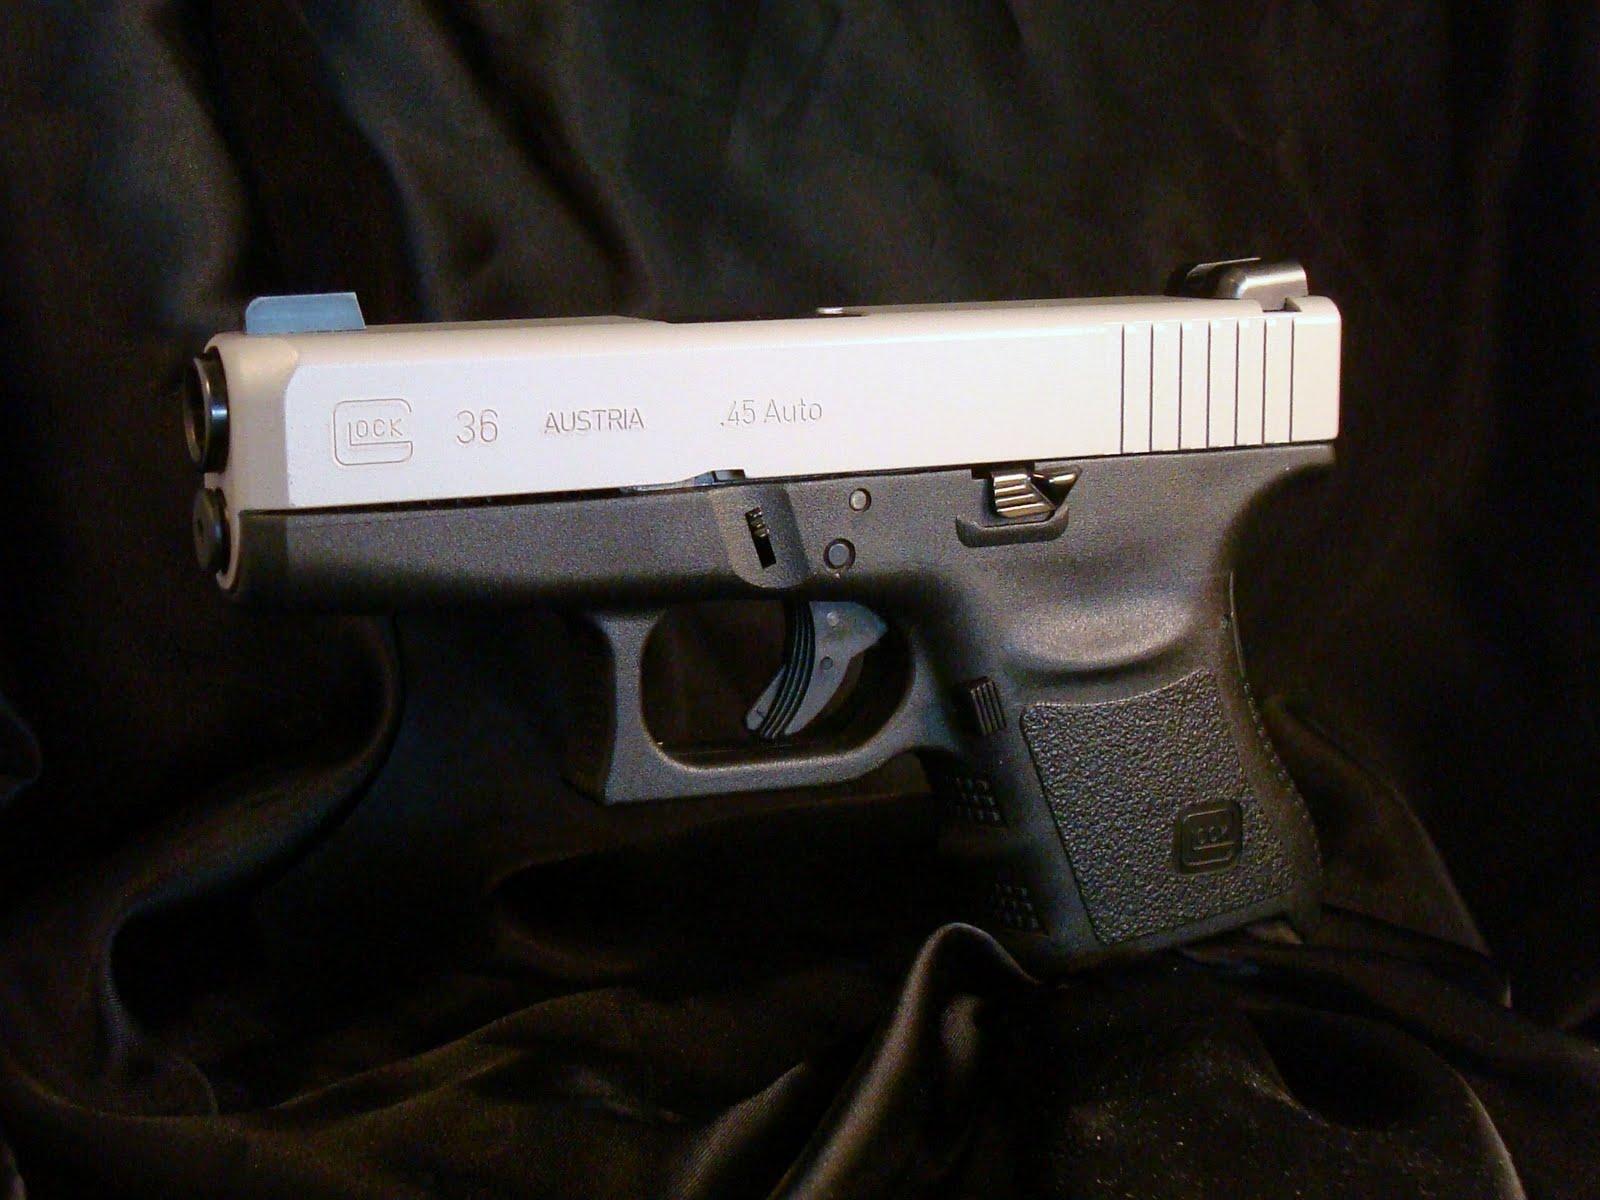 Average Joe's Handgun Reviews: Refinished Glock 36 Slide